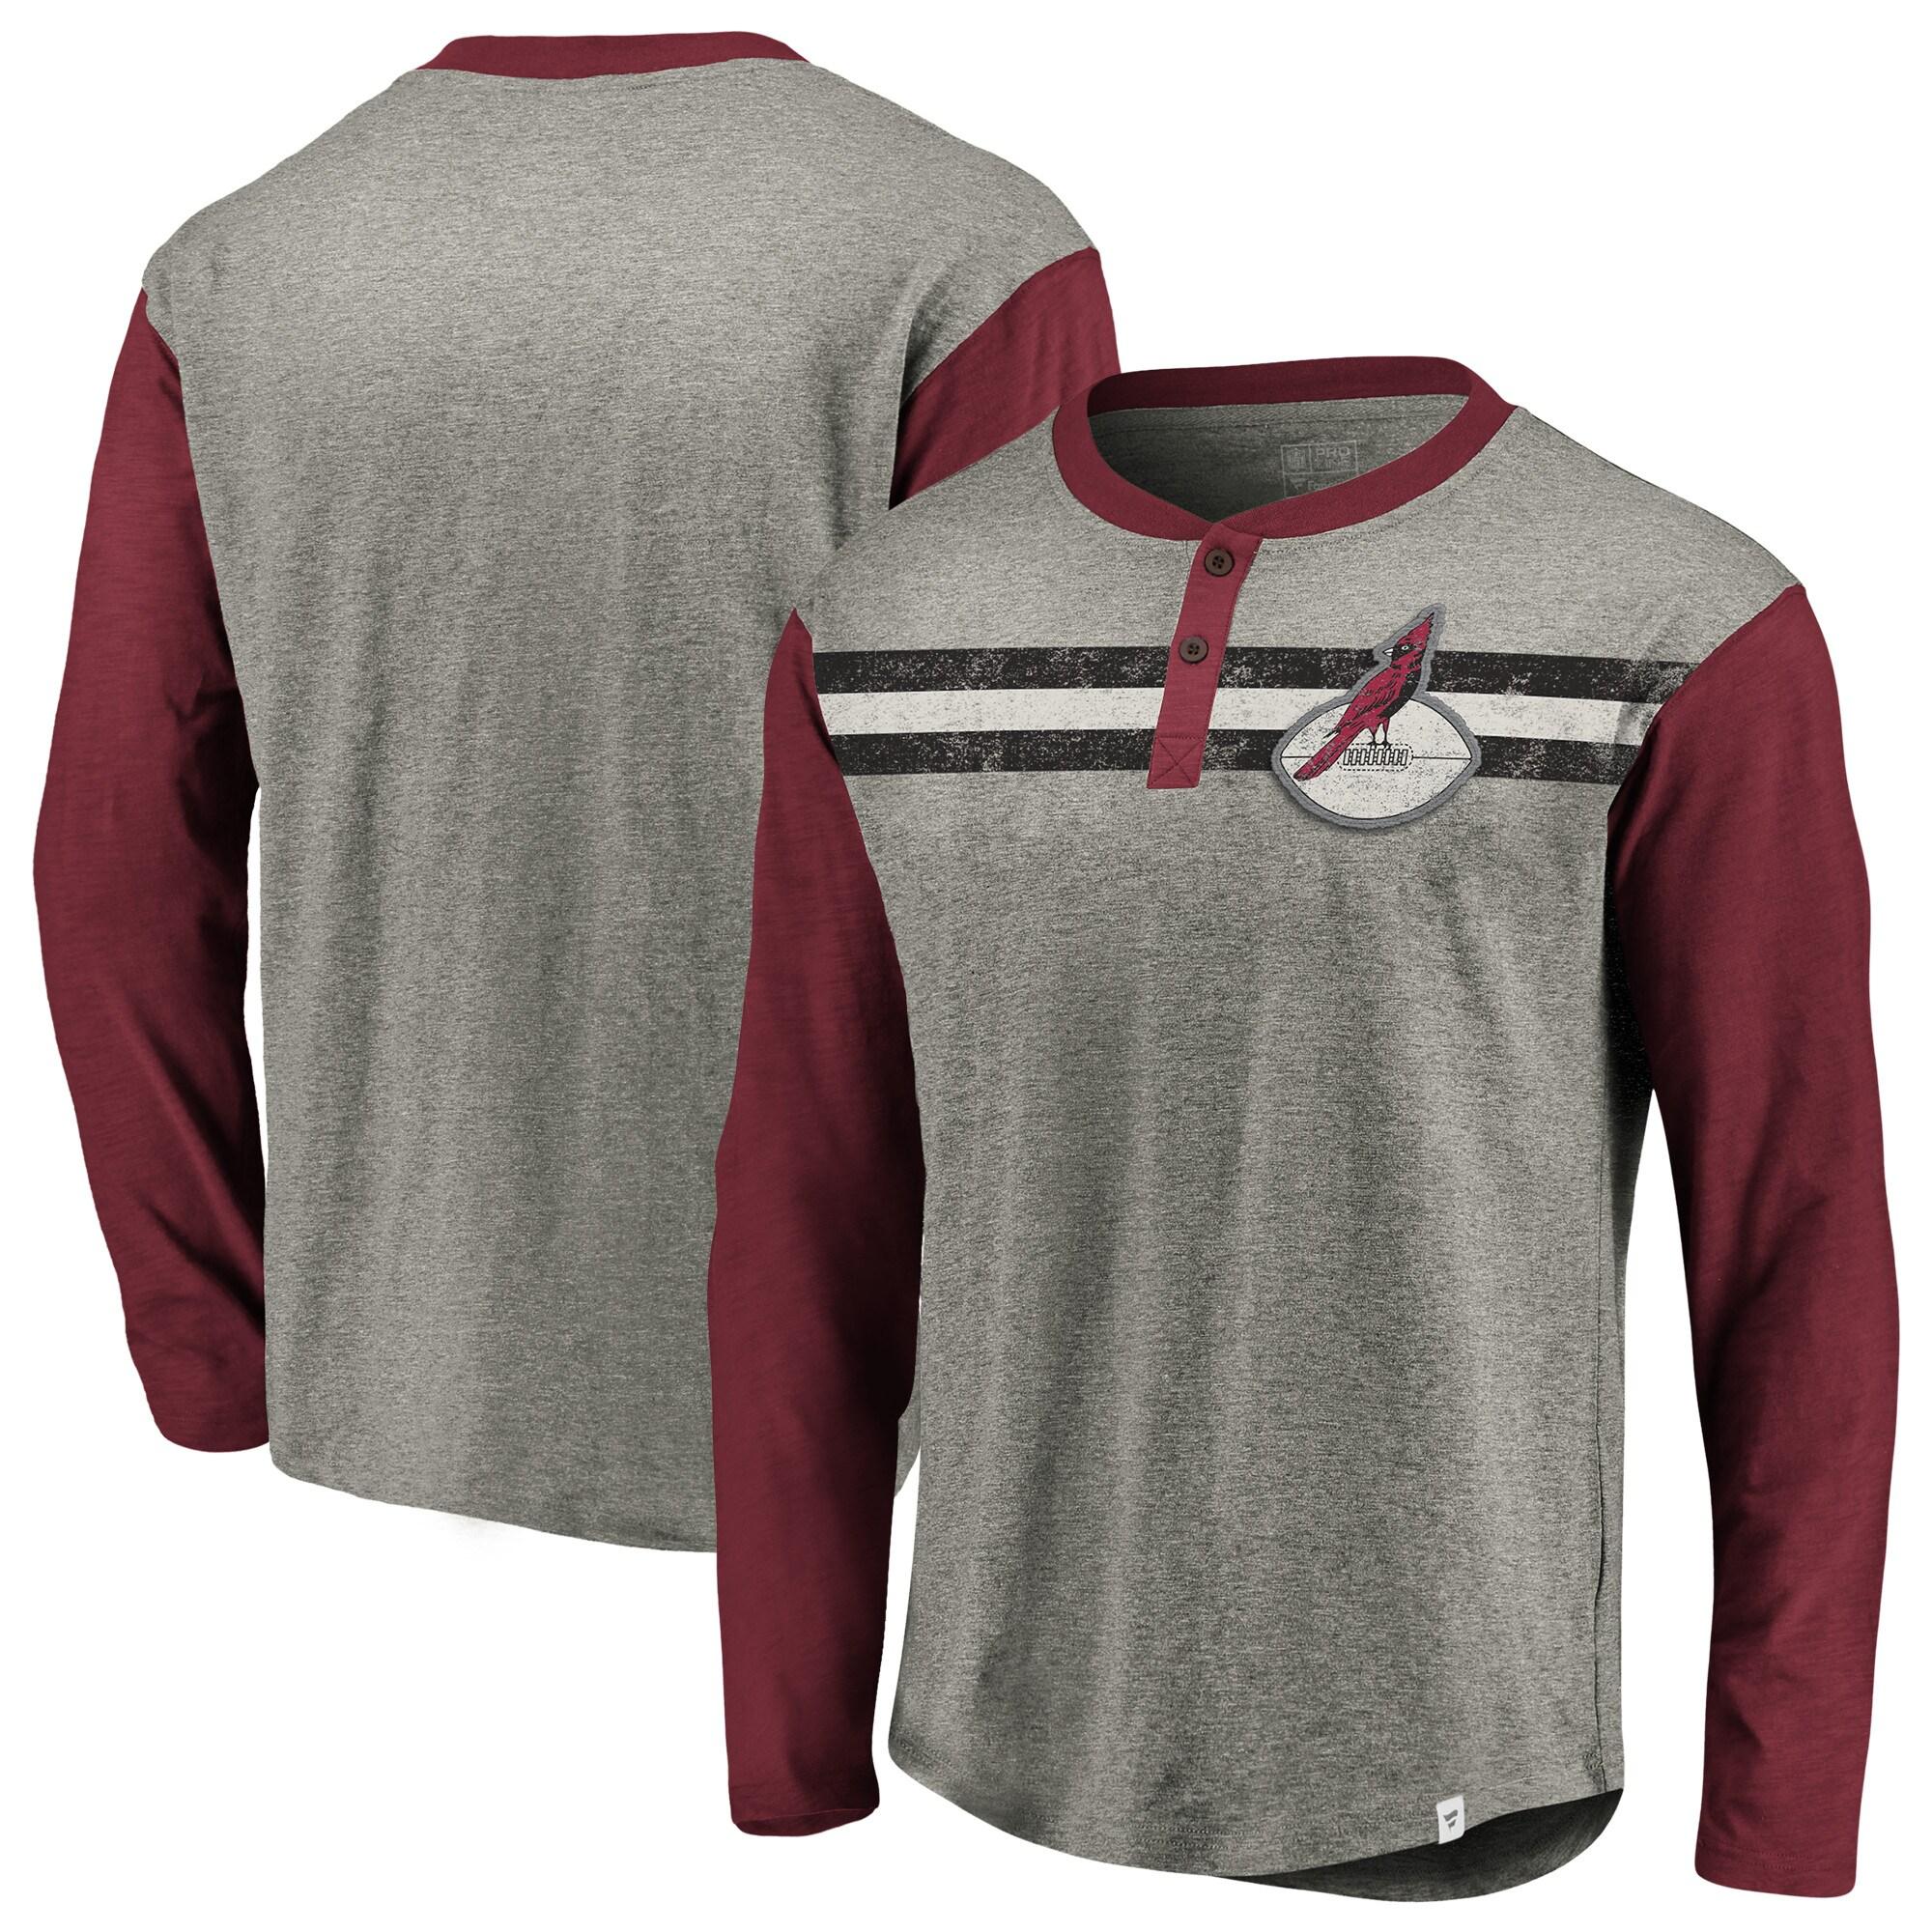 Arizona Cardinals NFL Pro Line by Fanatics Branded Big & Tall True Classics Henley Long Sleeve T-Shirt - Heathered Gray/Cardinal